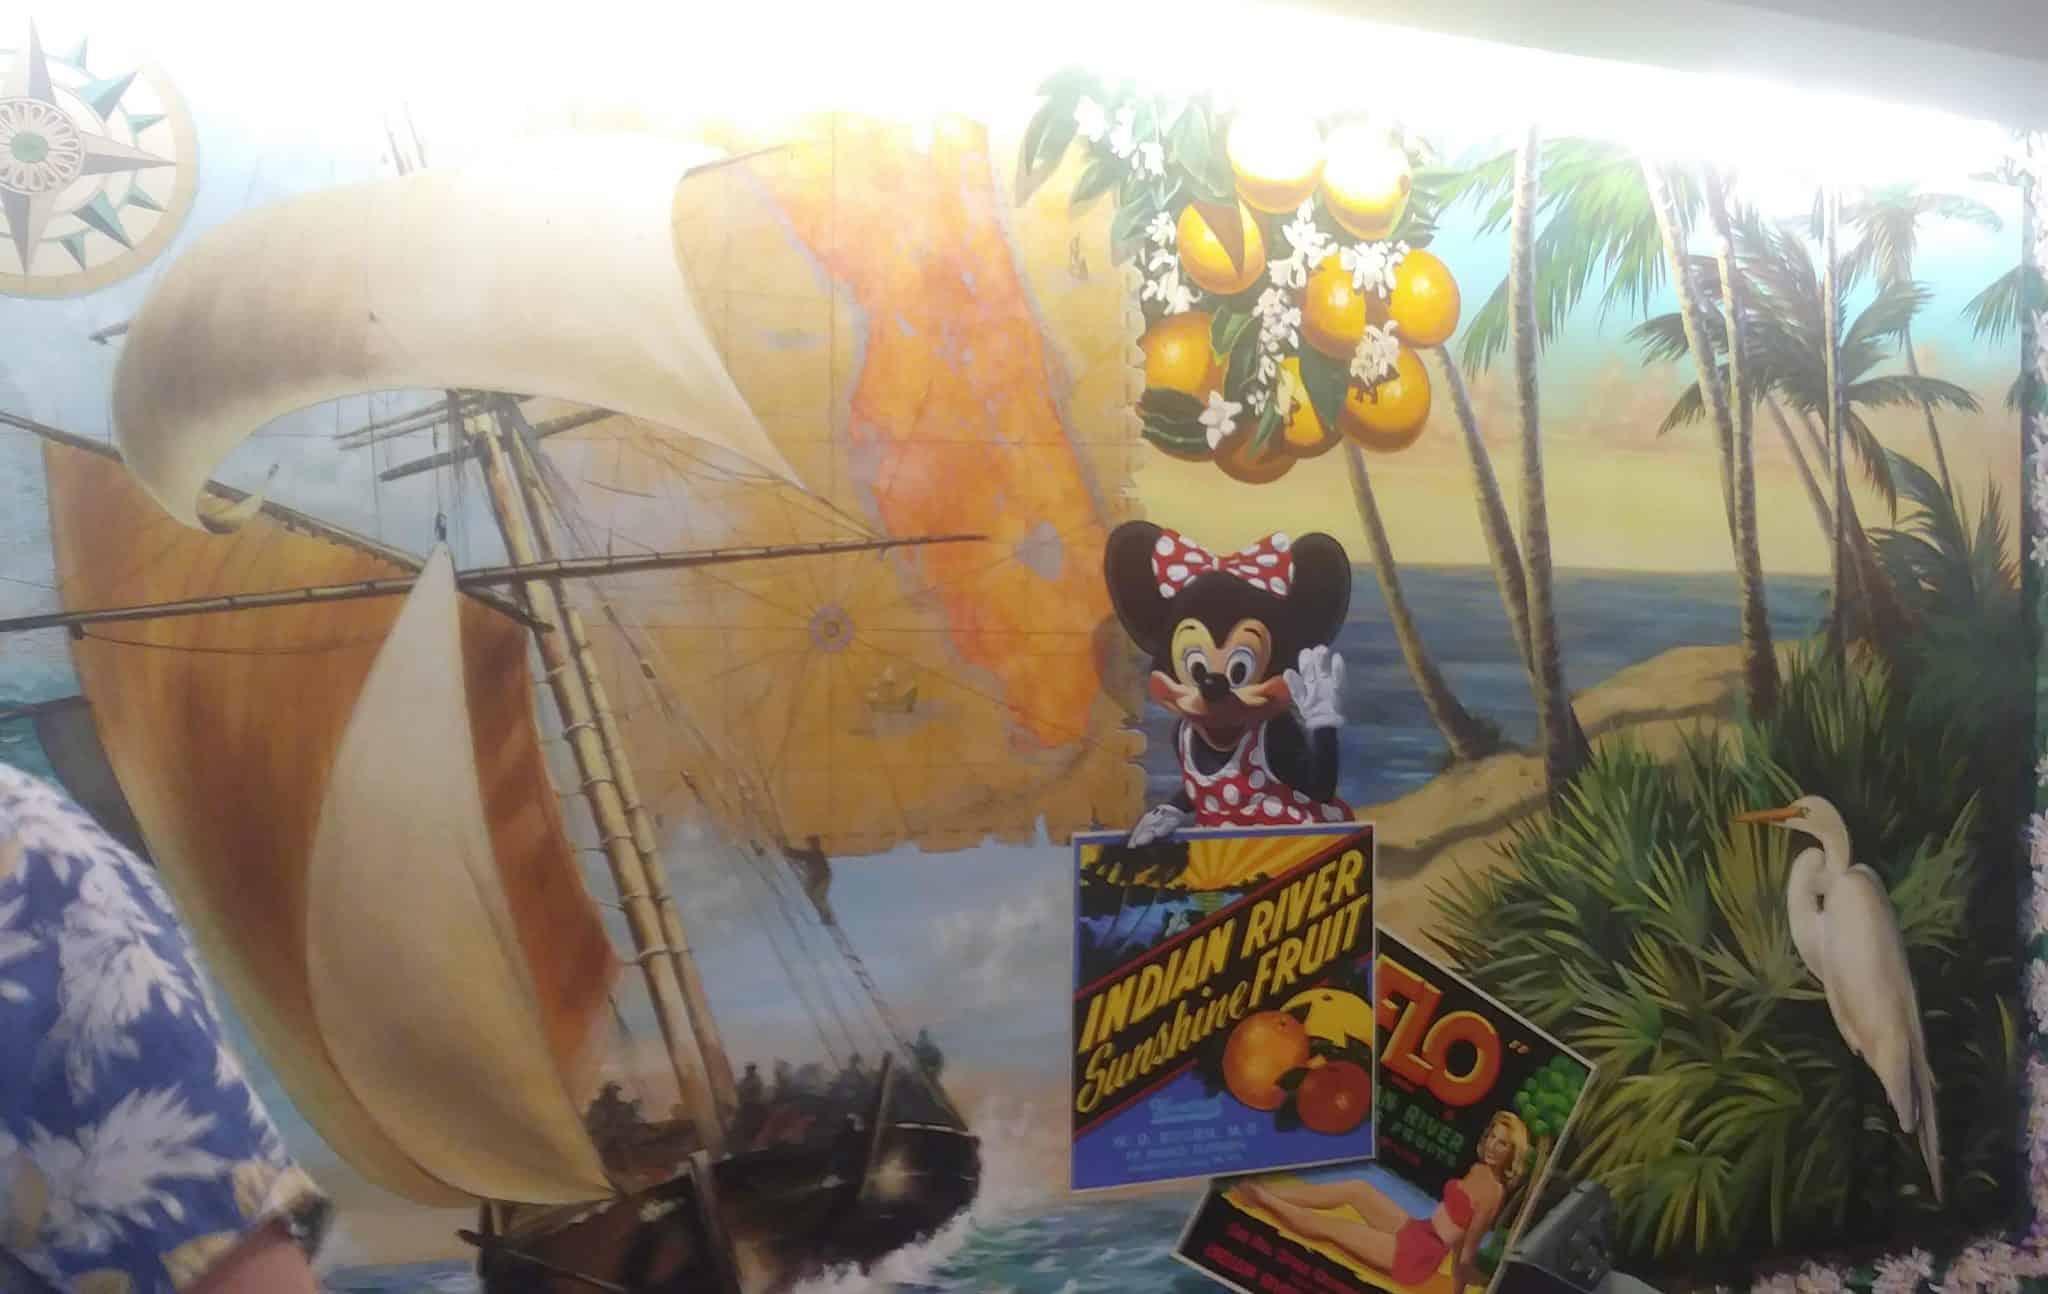 Disney's Vero Beach Resort - Wind & Waves Restaurant - Check-in Area